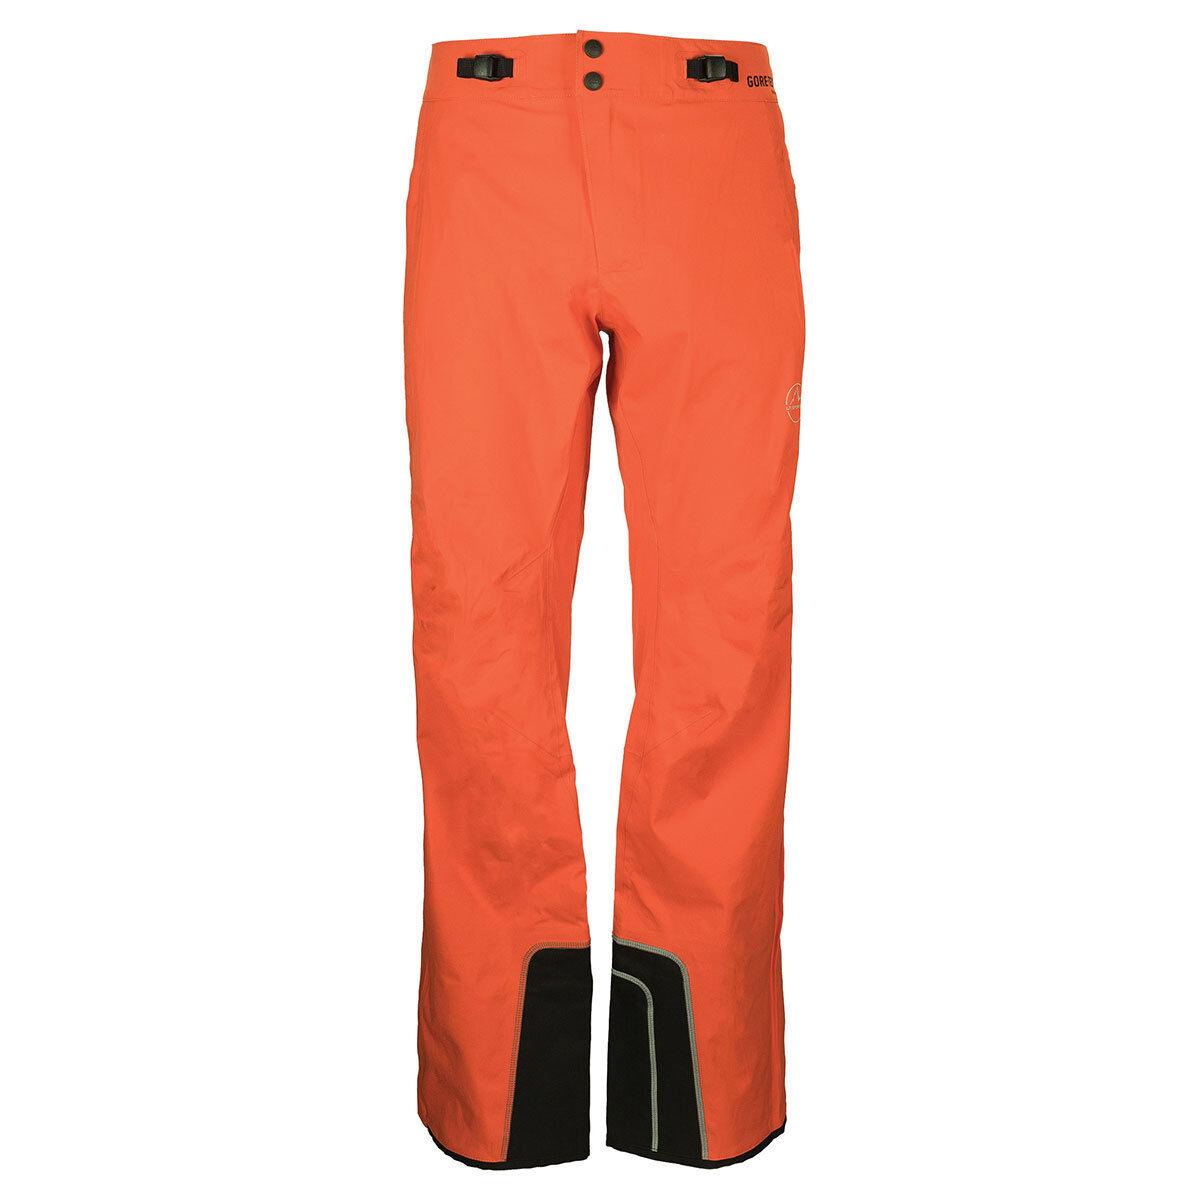 La Sportiva Storm Luchador 2.0 GTX Pantalones (M) Lava